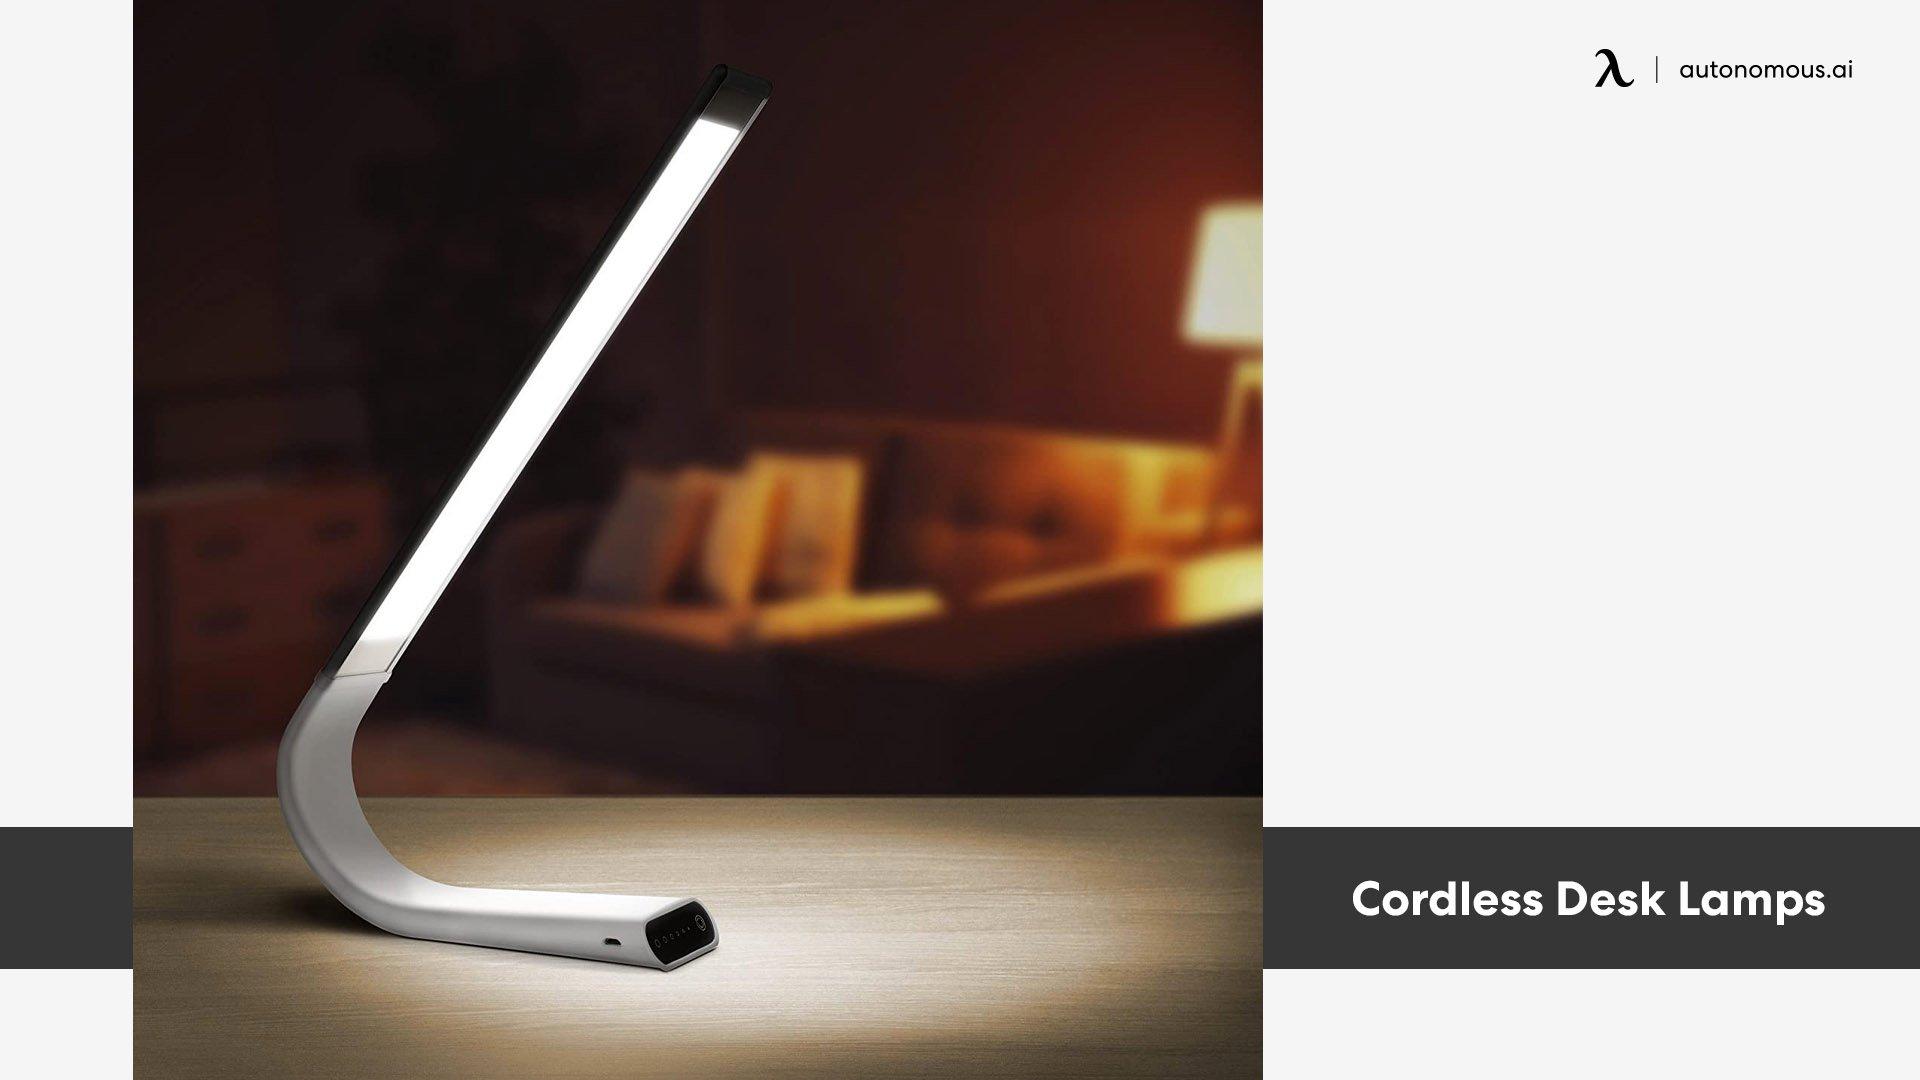 Photo of Cordless Desk Lamps